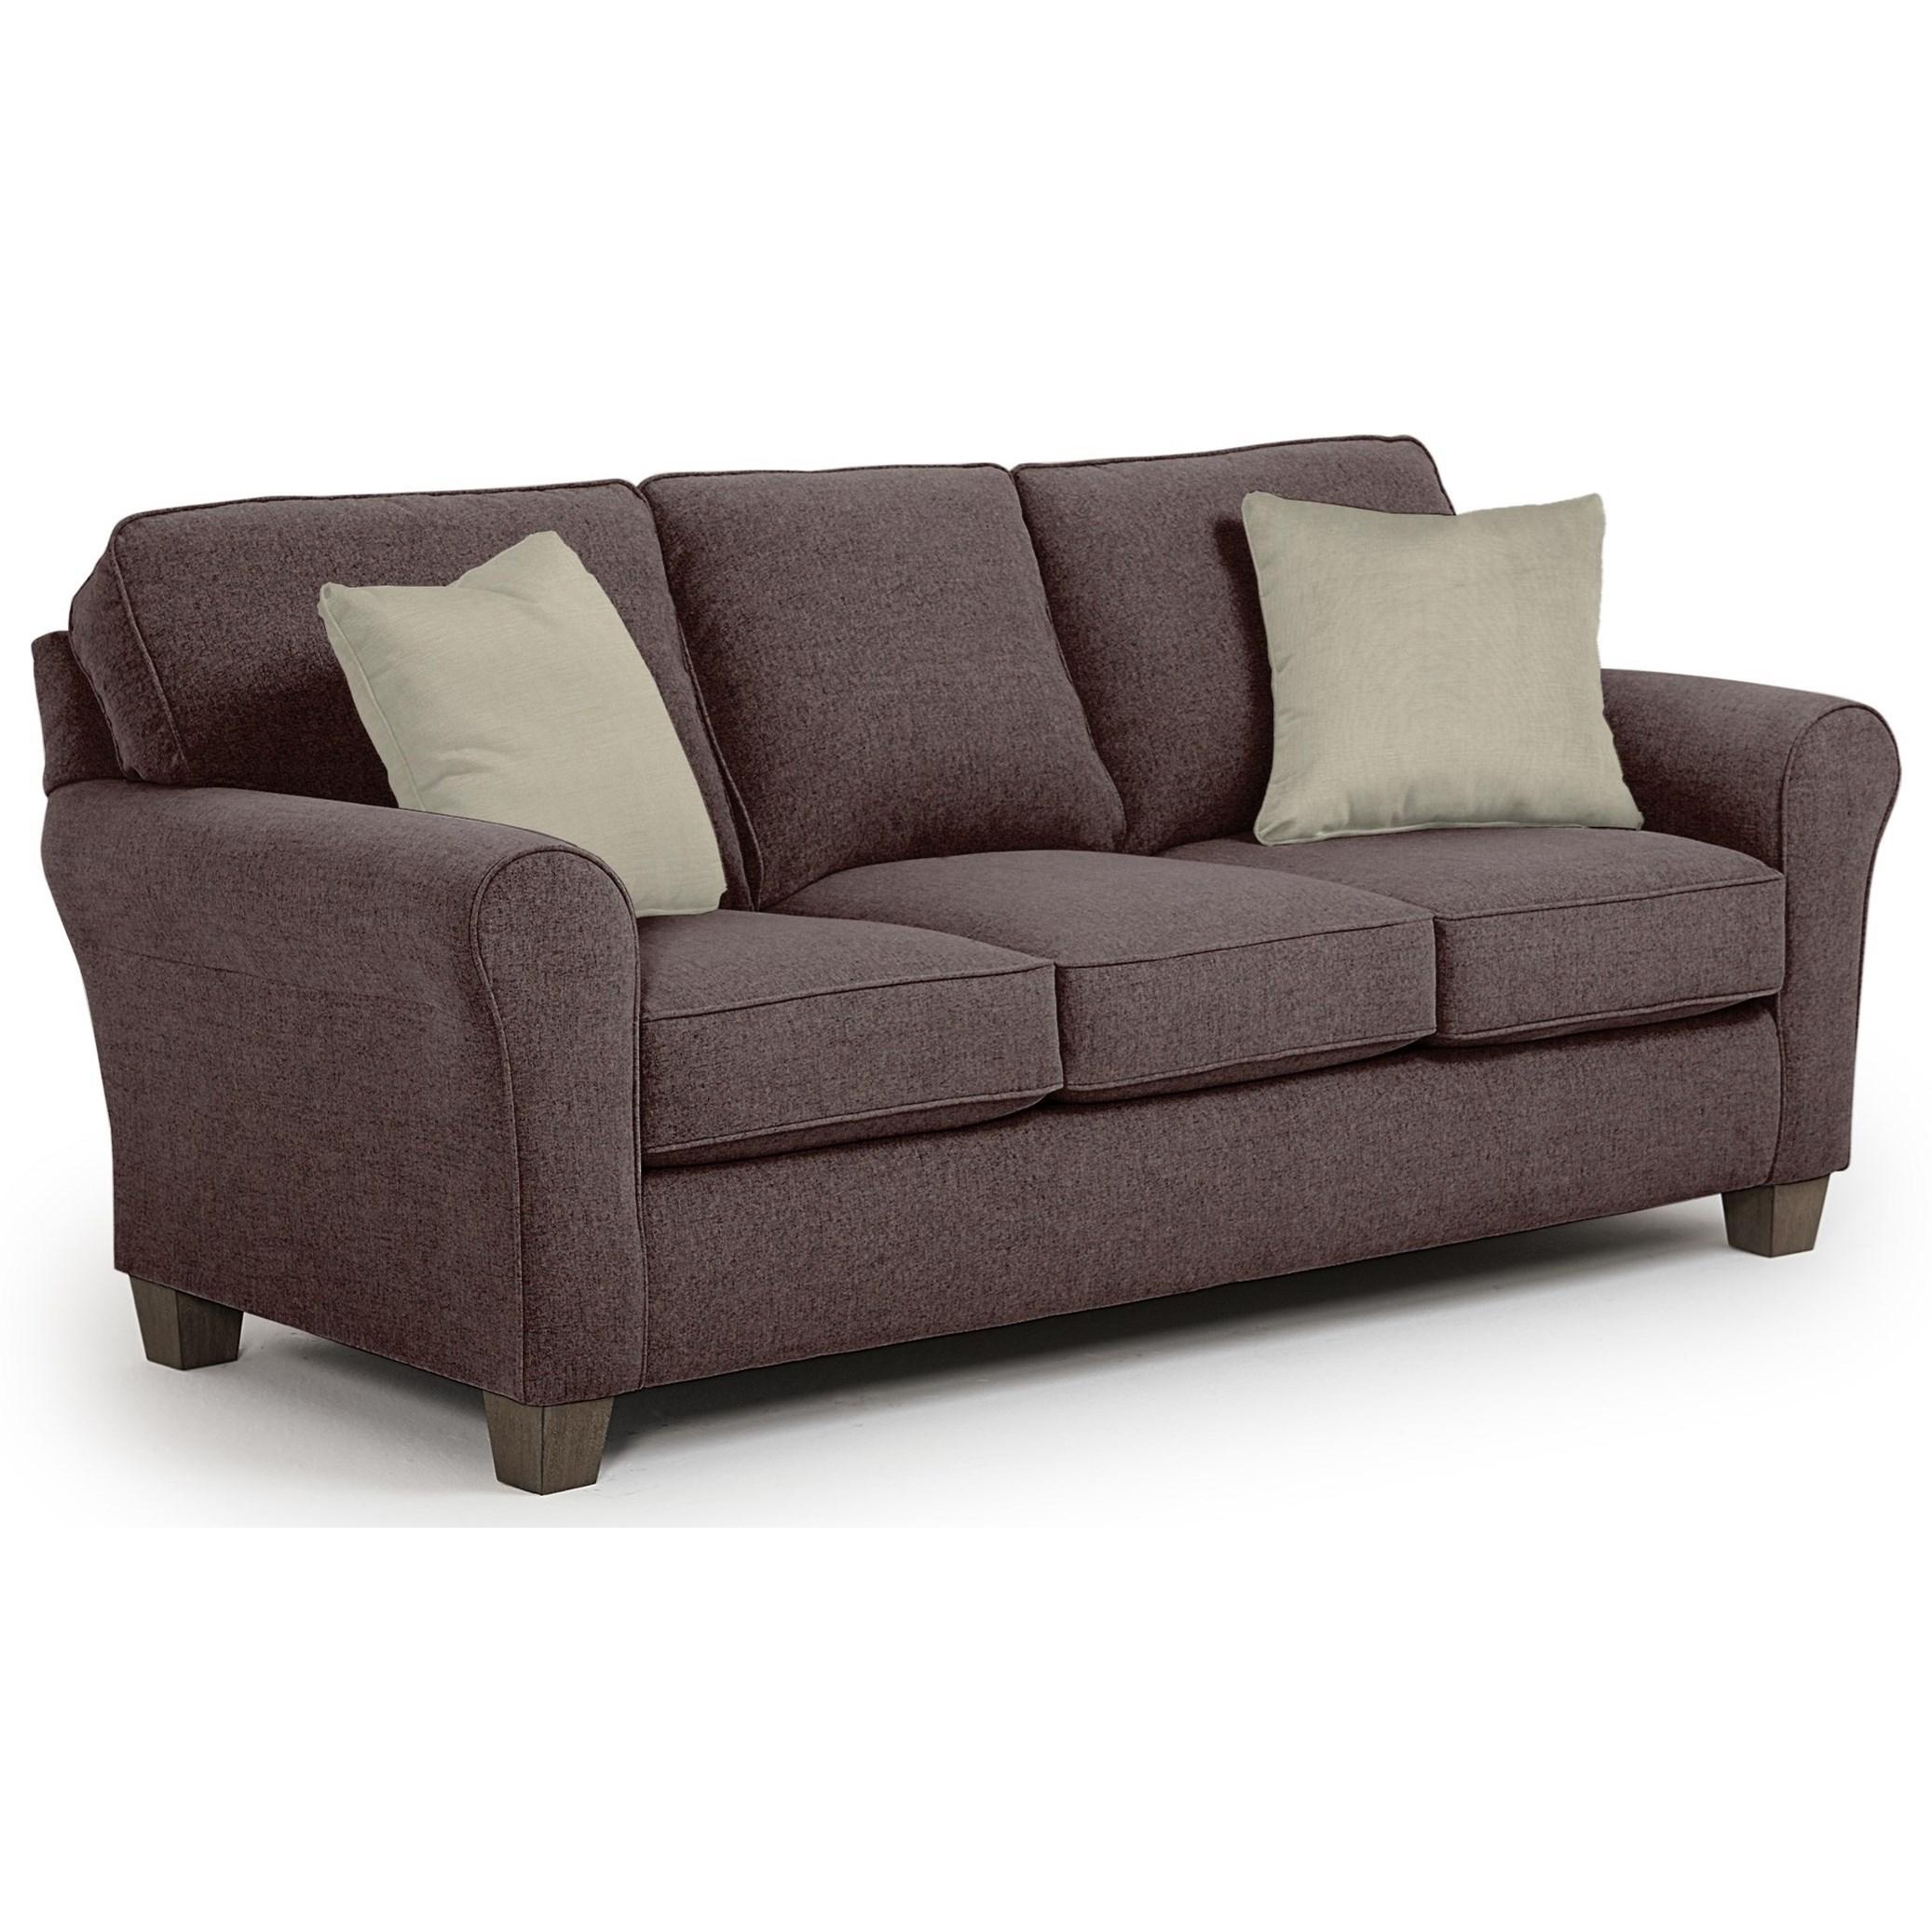 Annabel  Custom 3 Over 3 Sofa by Best Home Furnishings at Baer's Furniture